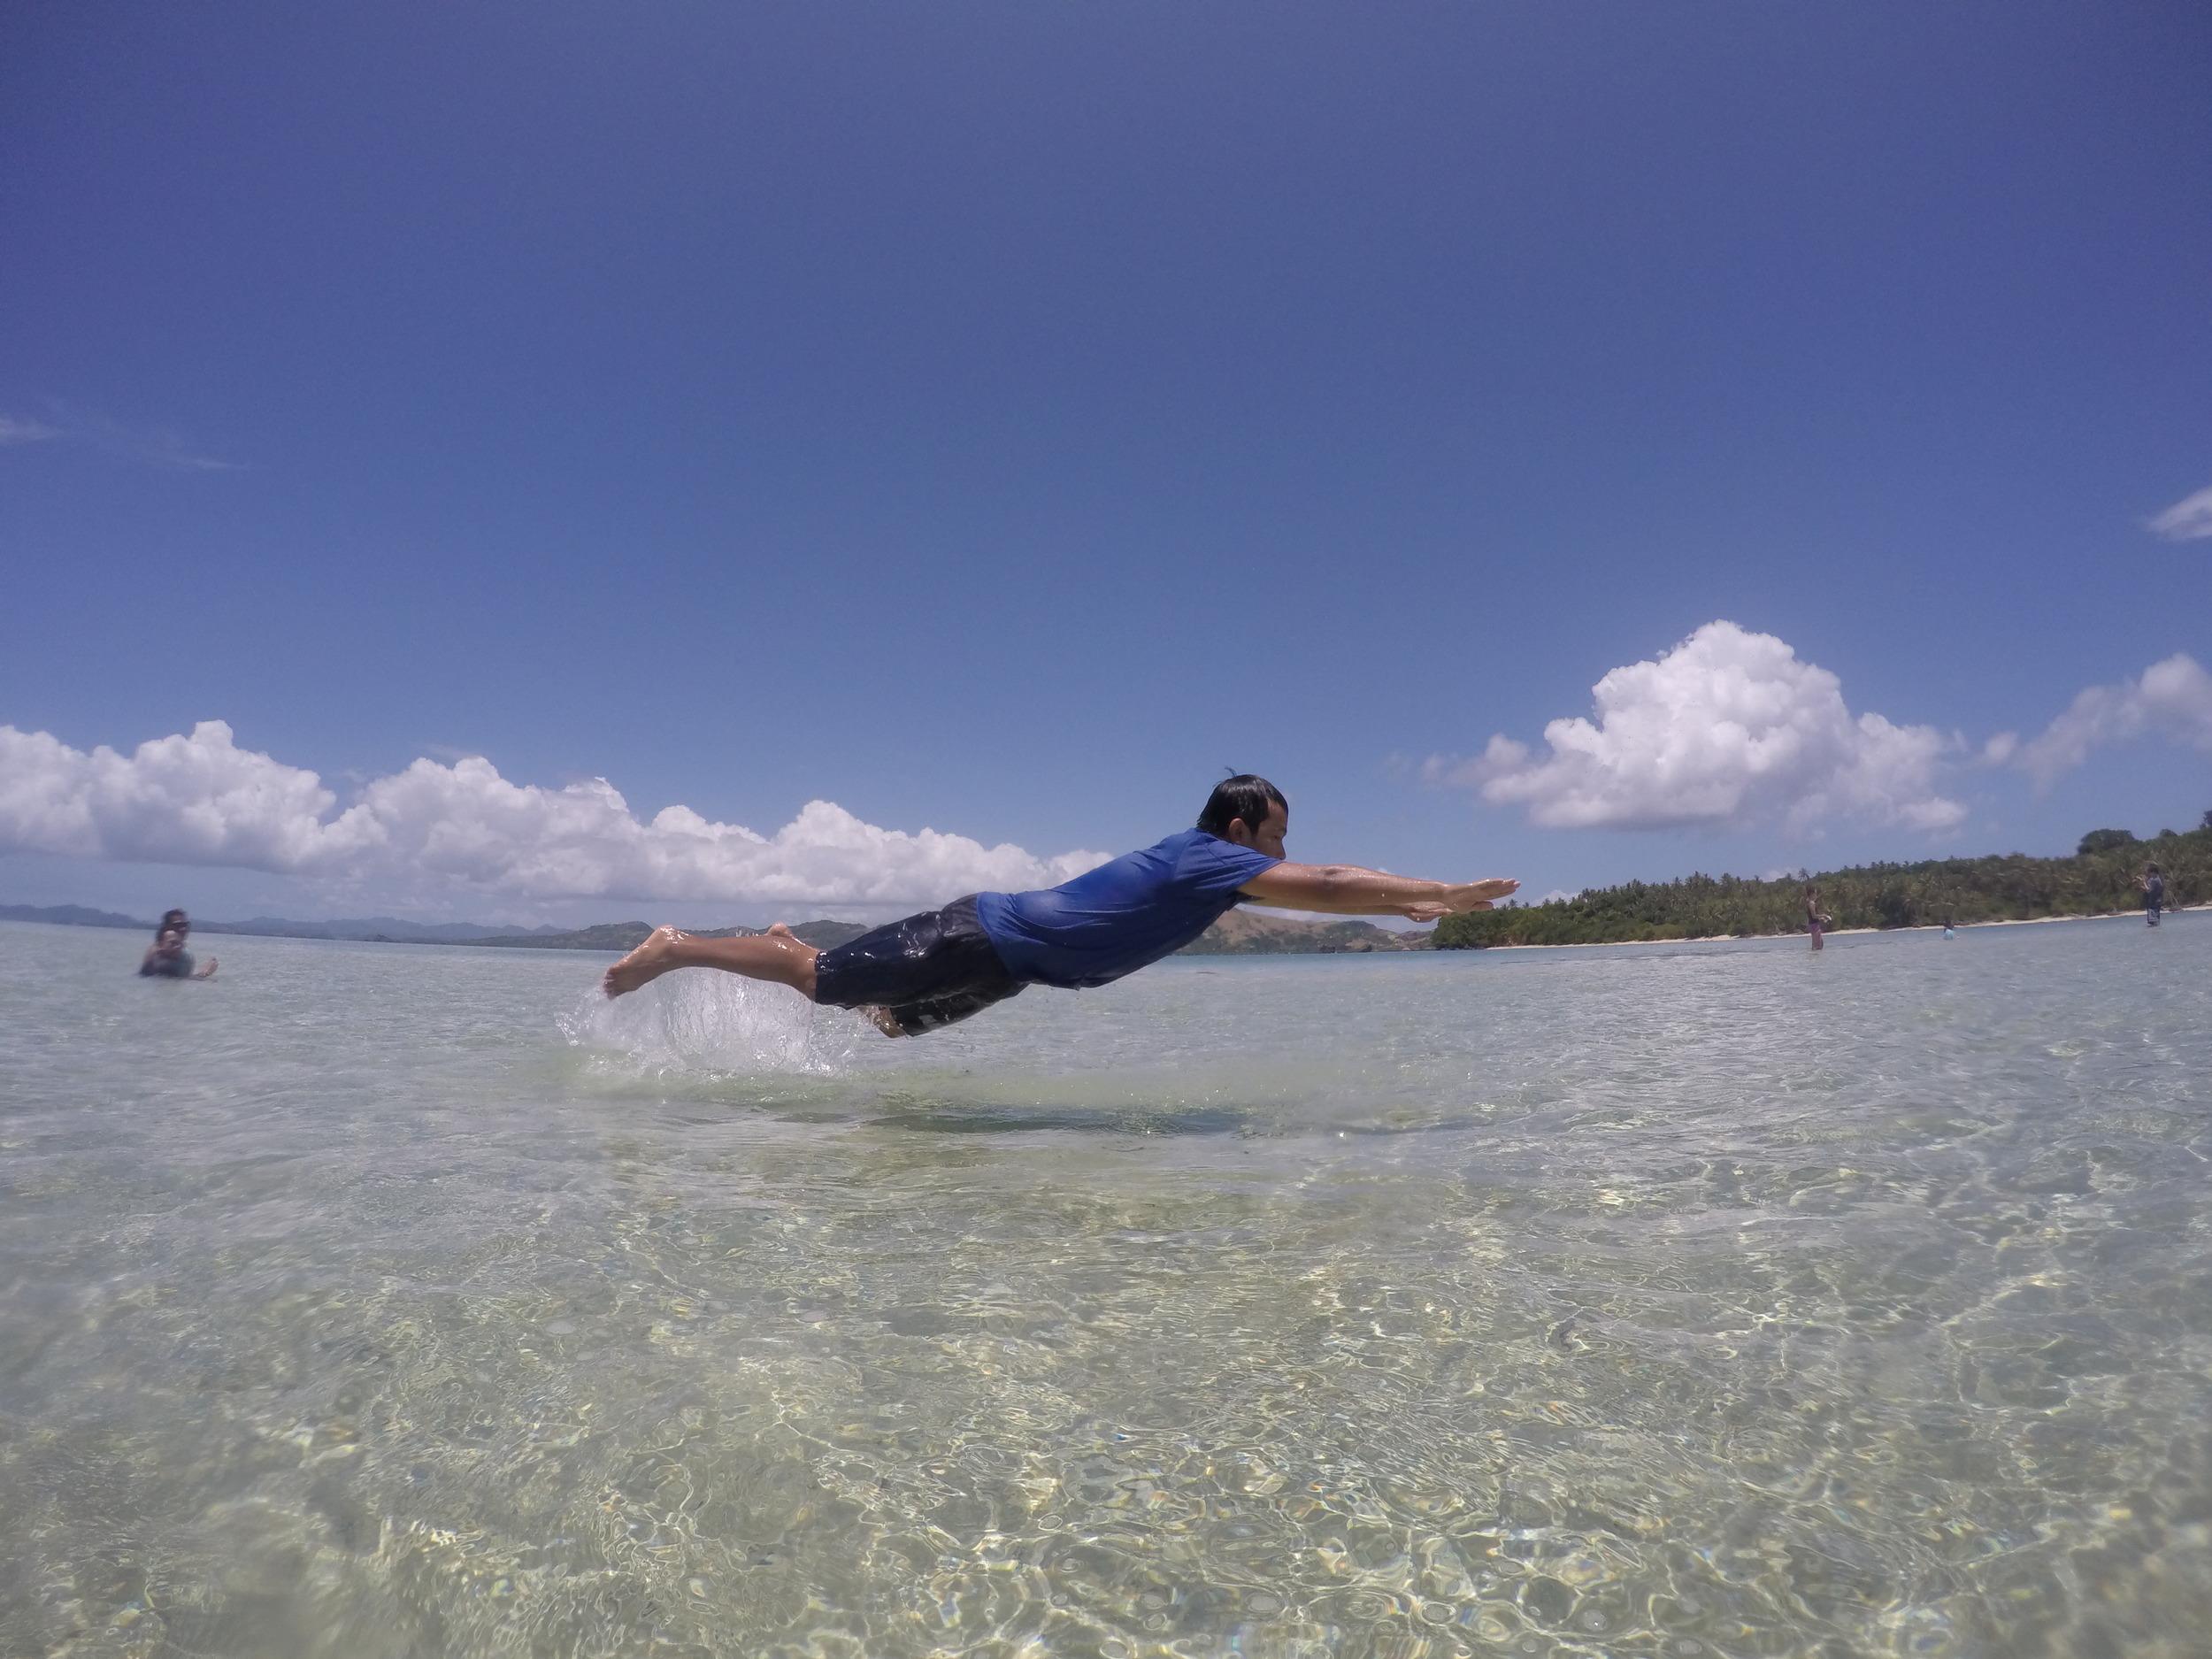 PLAYING AROUND THE WATER